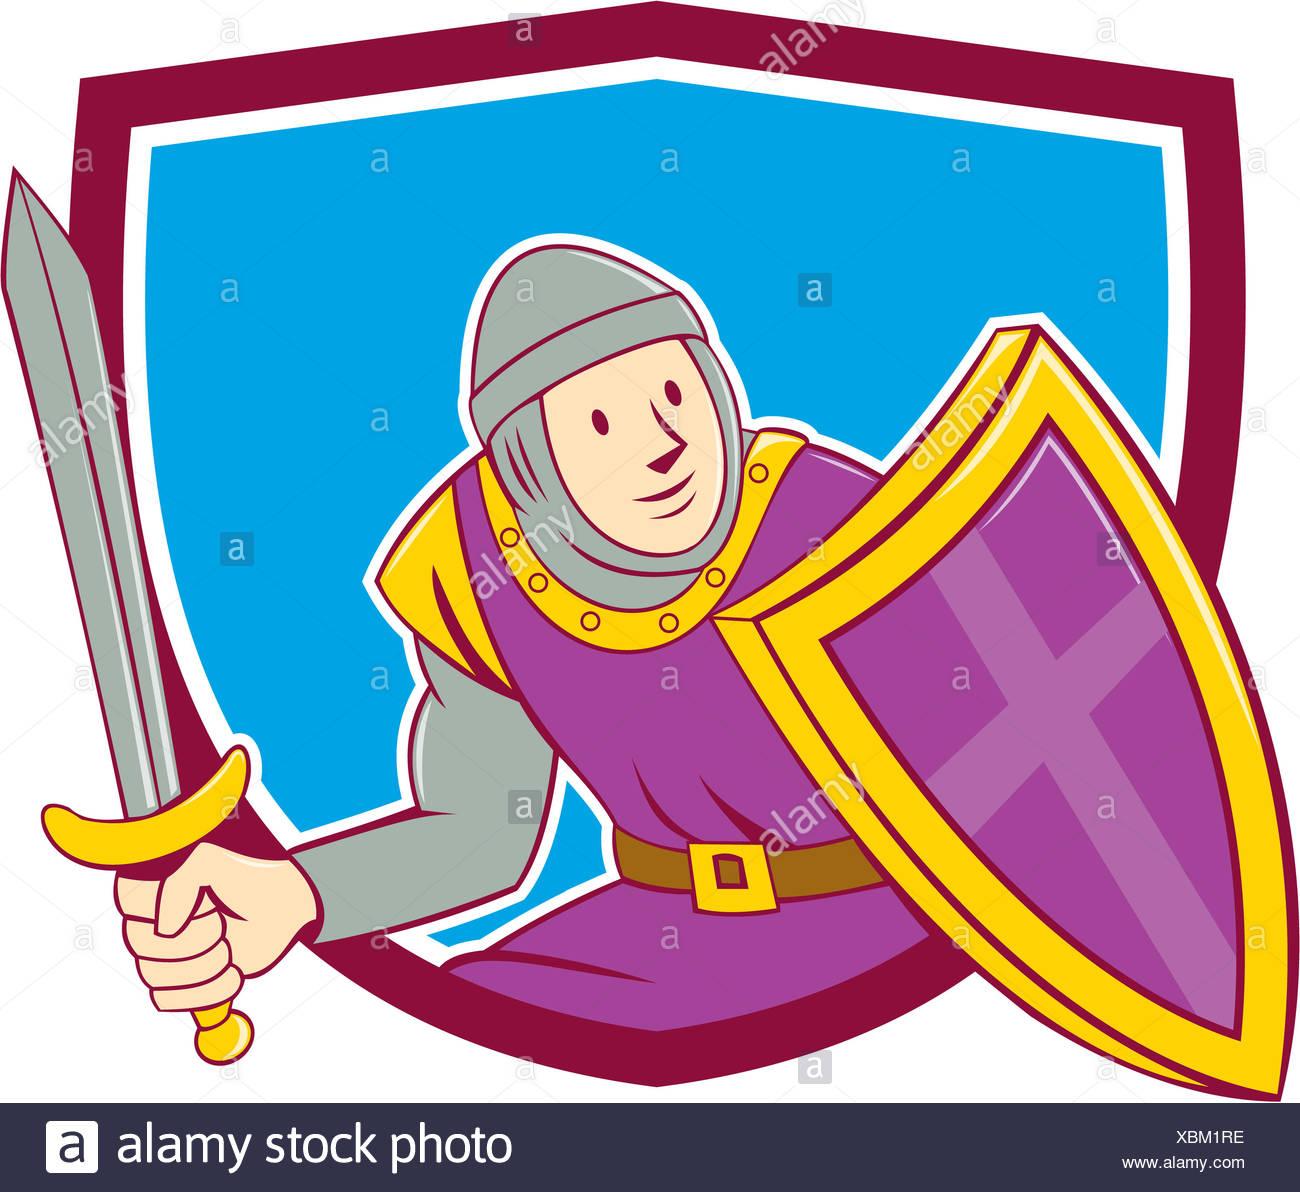 VeKtor Stock - Schwert, kämpfen. Clipart Illustration gg77722943 - GoGraph